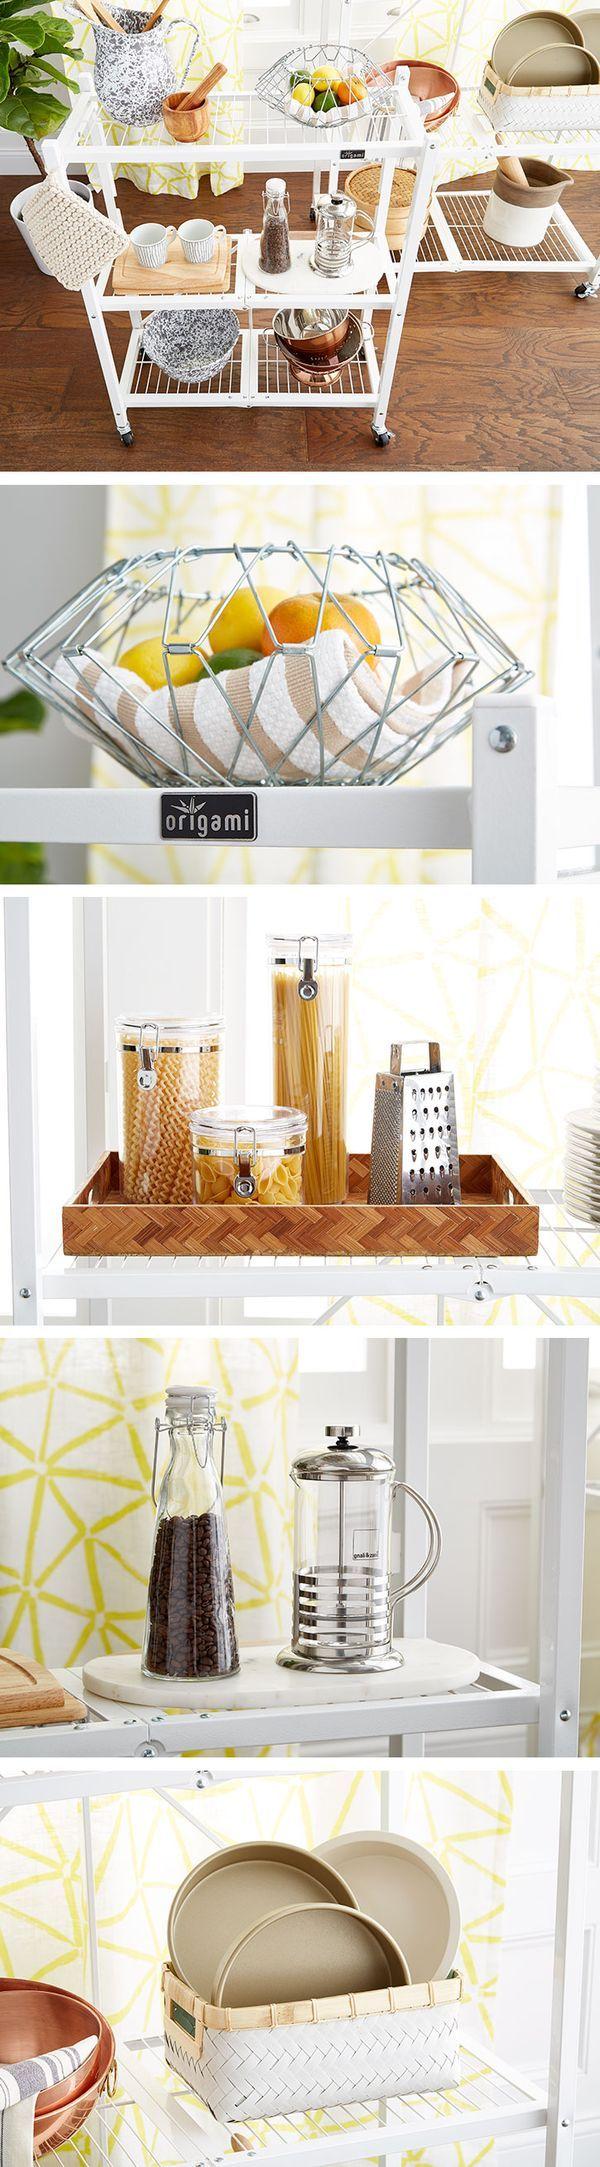 109 best shelving images on pinterest container shop container origami 3 shelf folding rack jeuxipadfo Choice Image